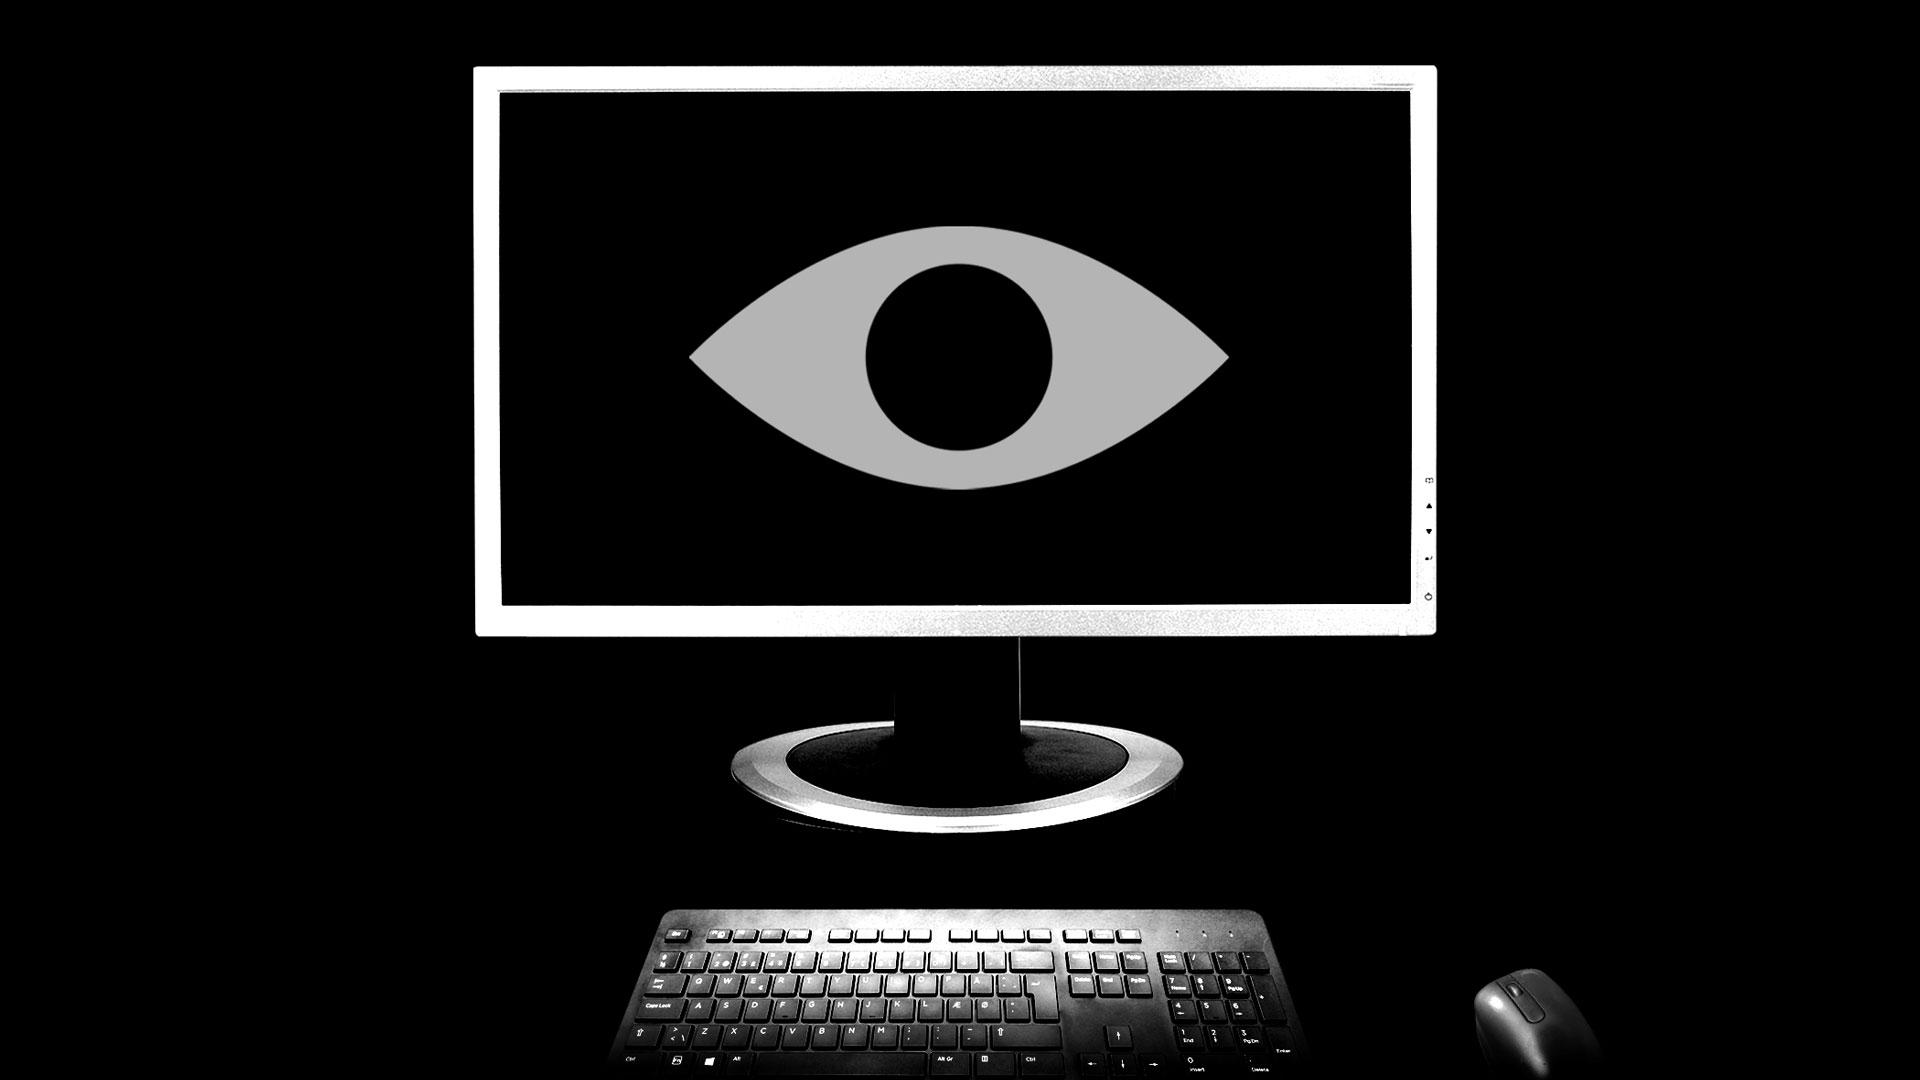 computer_blackmail_002.jpg